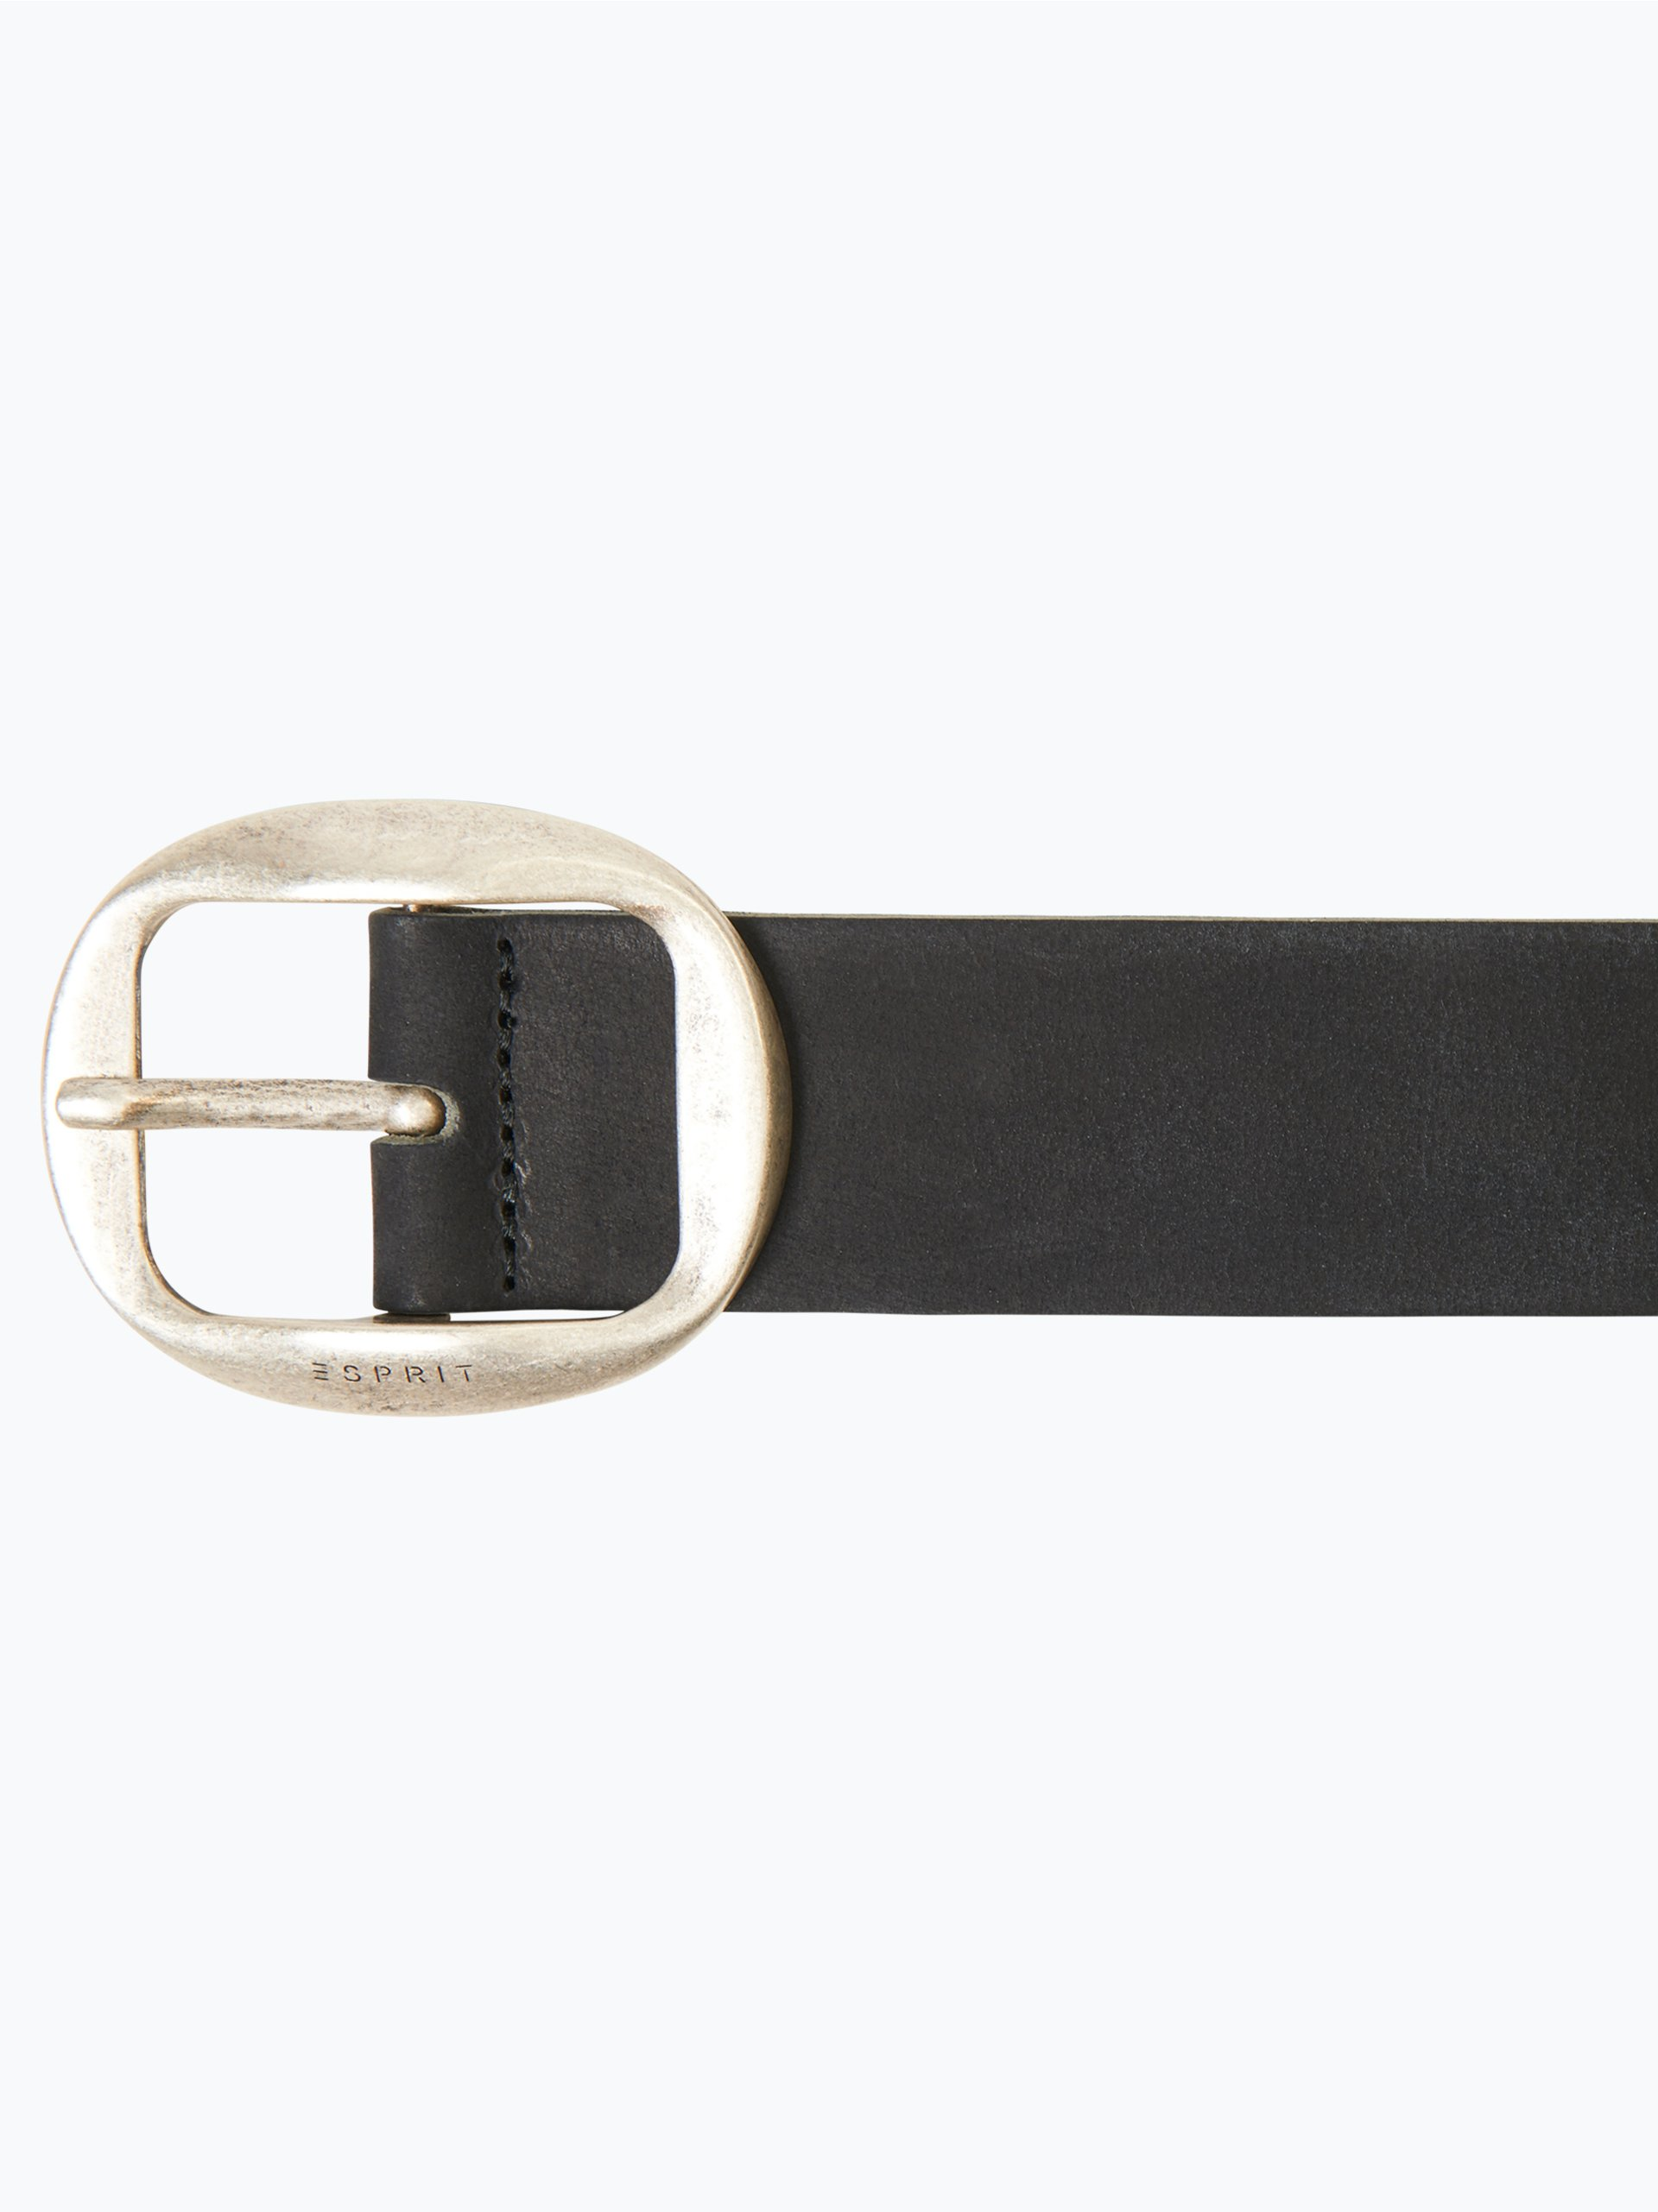 Esprit Casual Damen Gürtel aus Leder